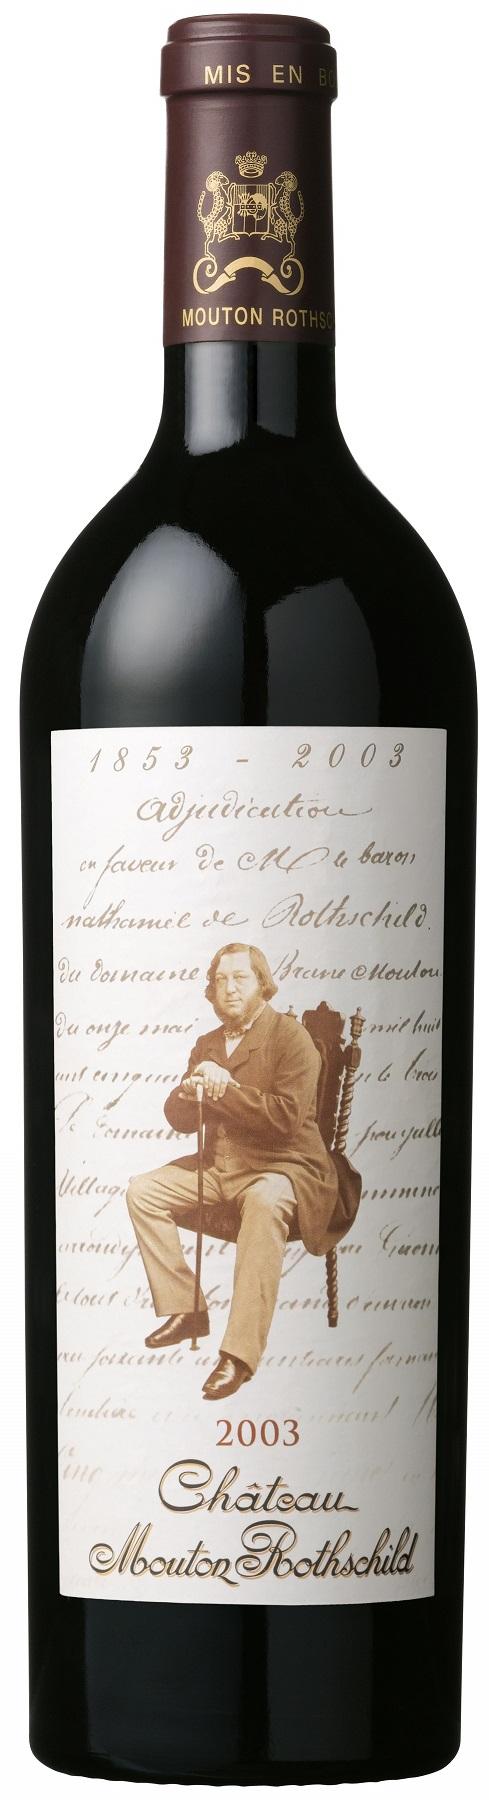 2003 Château Mouton Rothschild